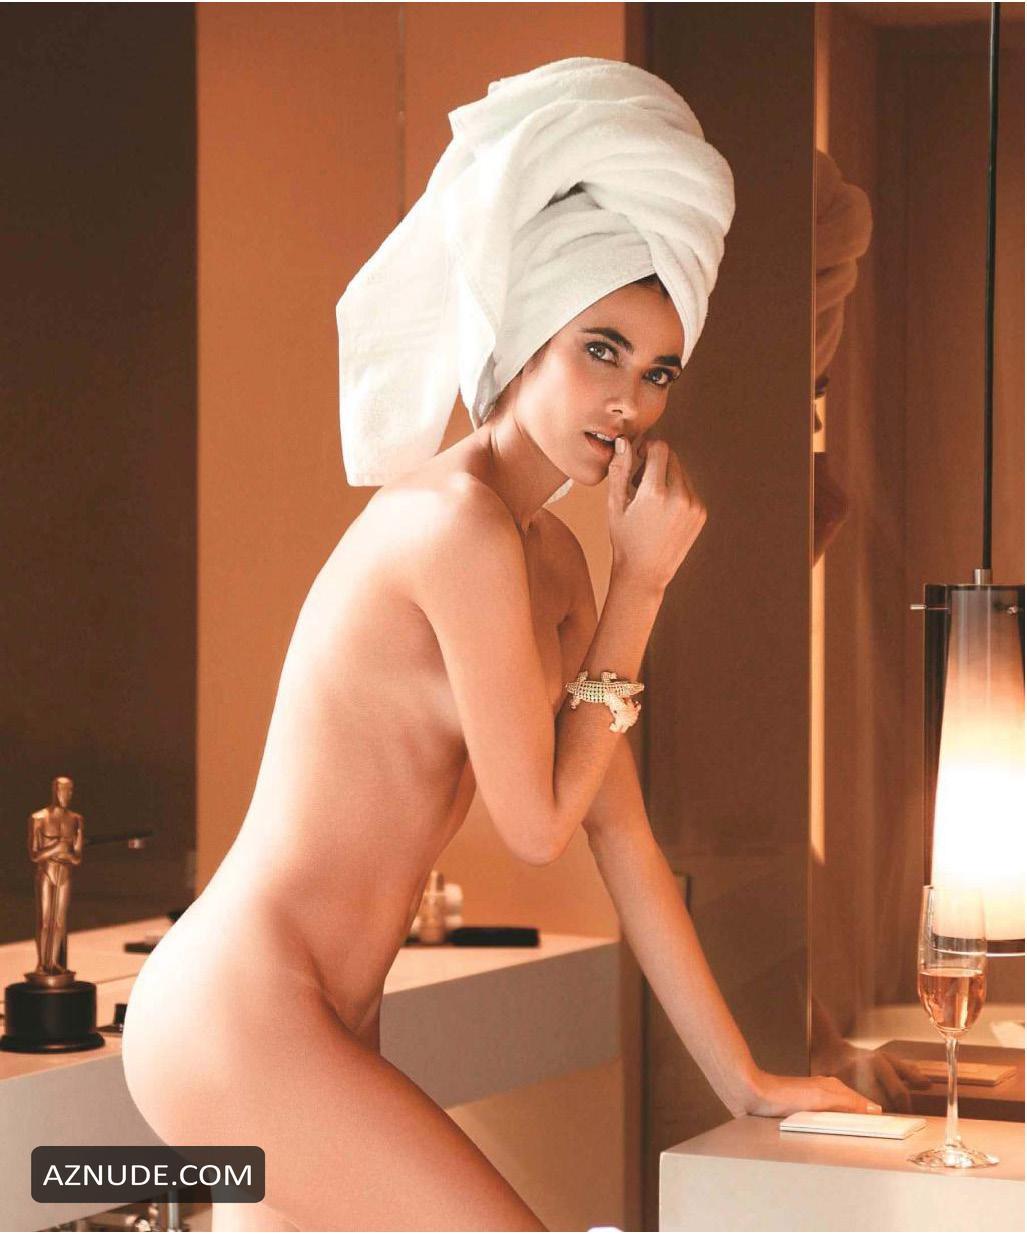 Marly velasquez nude sexy pics new pictures